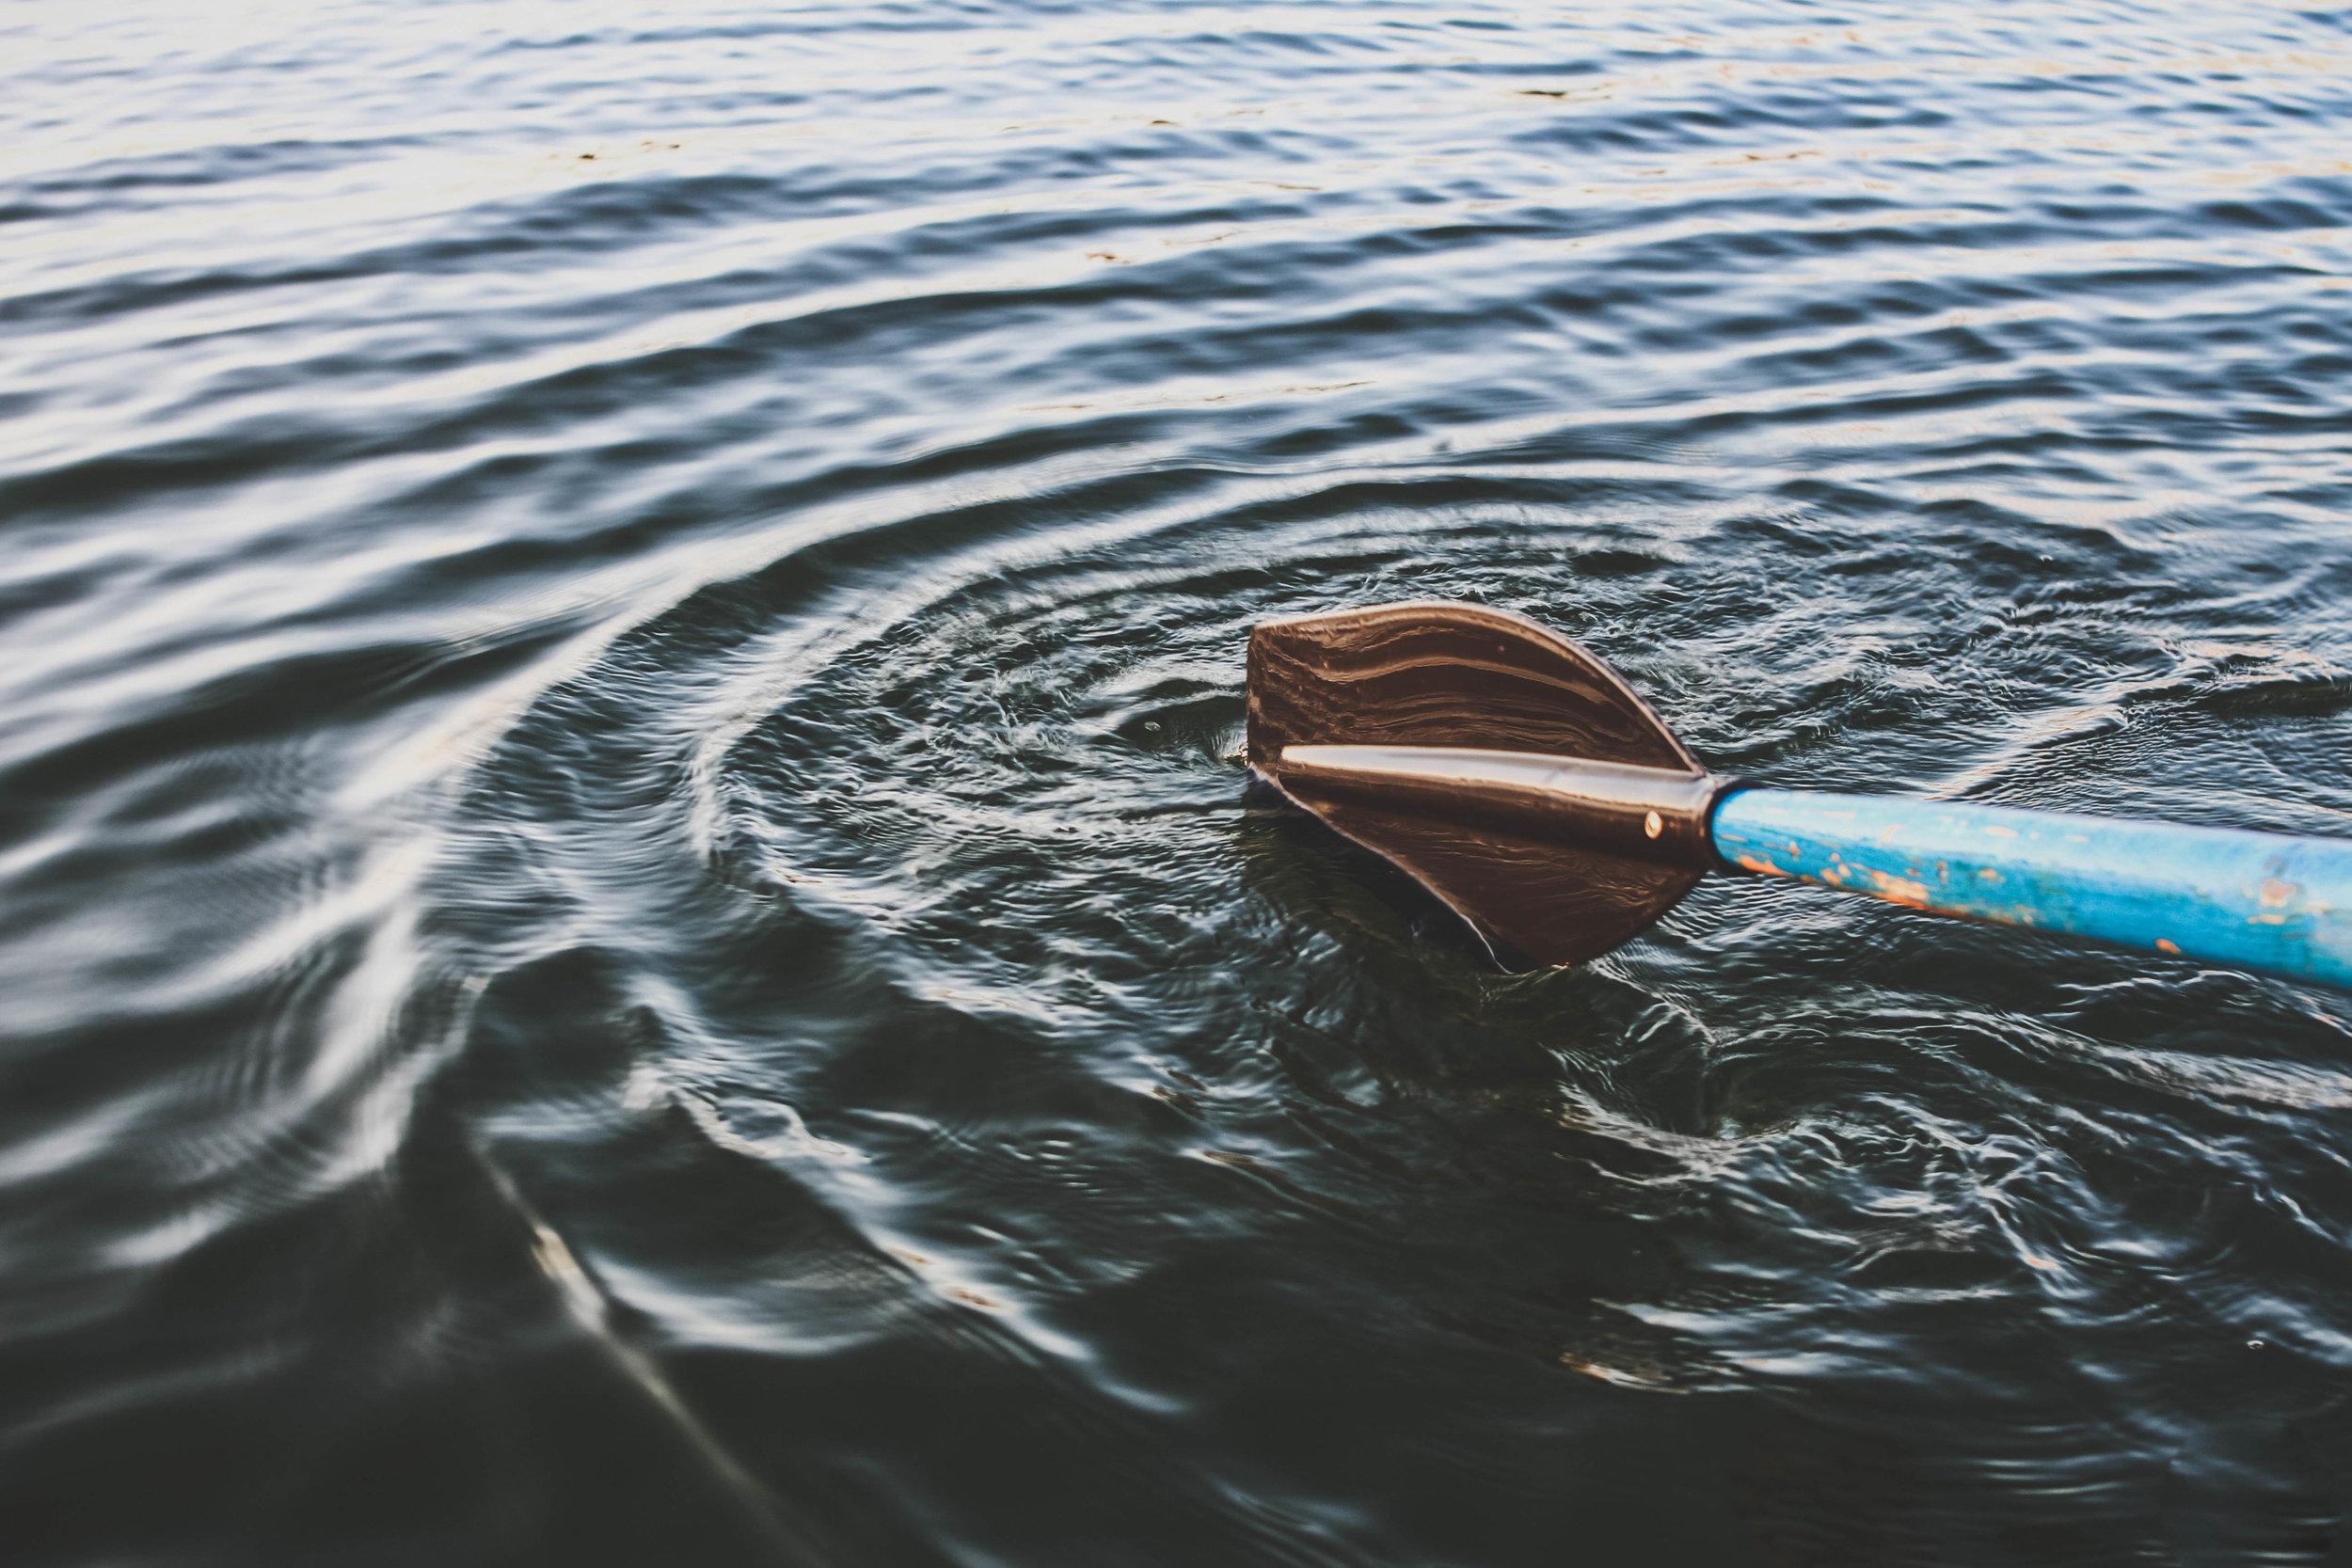 Lågterskelturar// Low Treshold Trips - •Mandag – Havkajakk•Tirsdag – Dykking•Torsdag – Elvekajakk-----------------------•Mondays – Sea kayaking•Tuesdays – Diving•Thursdays – River kayaking